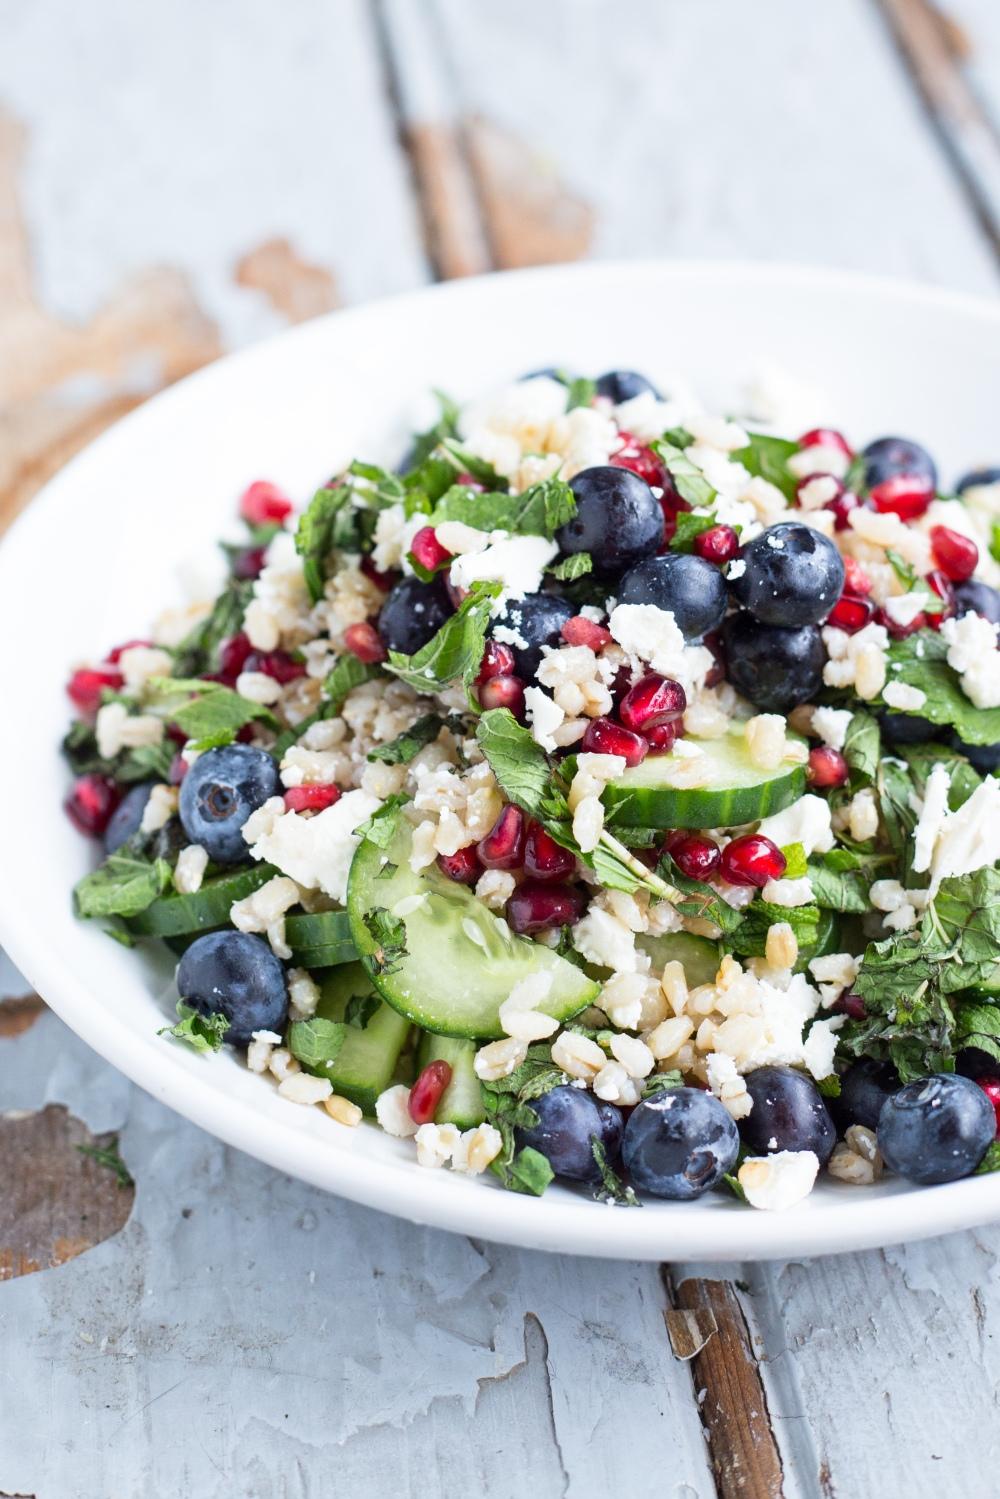 Gerst Salade